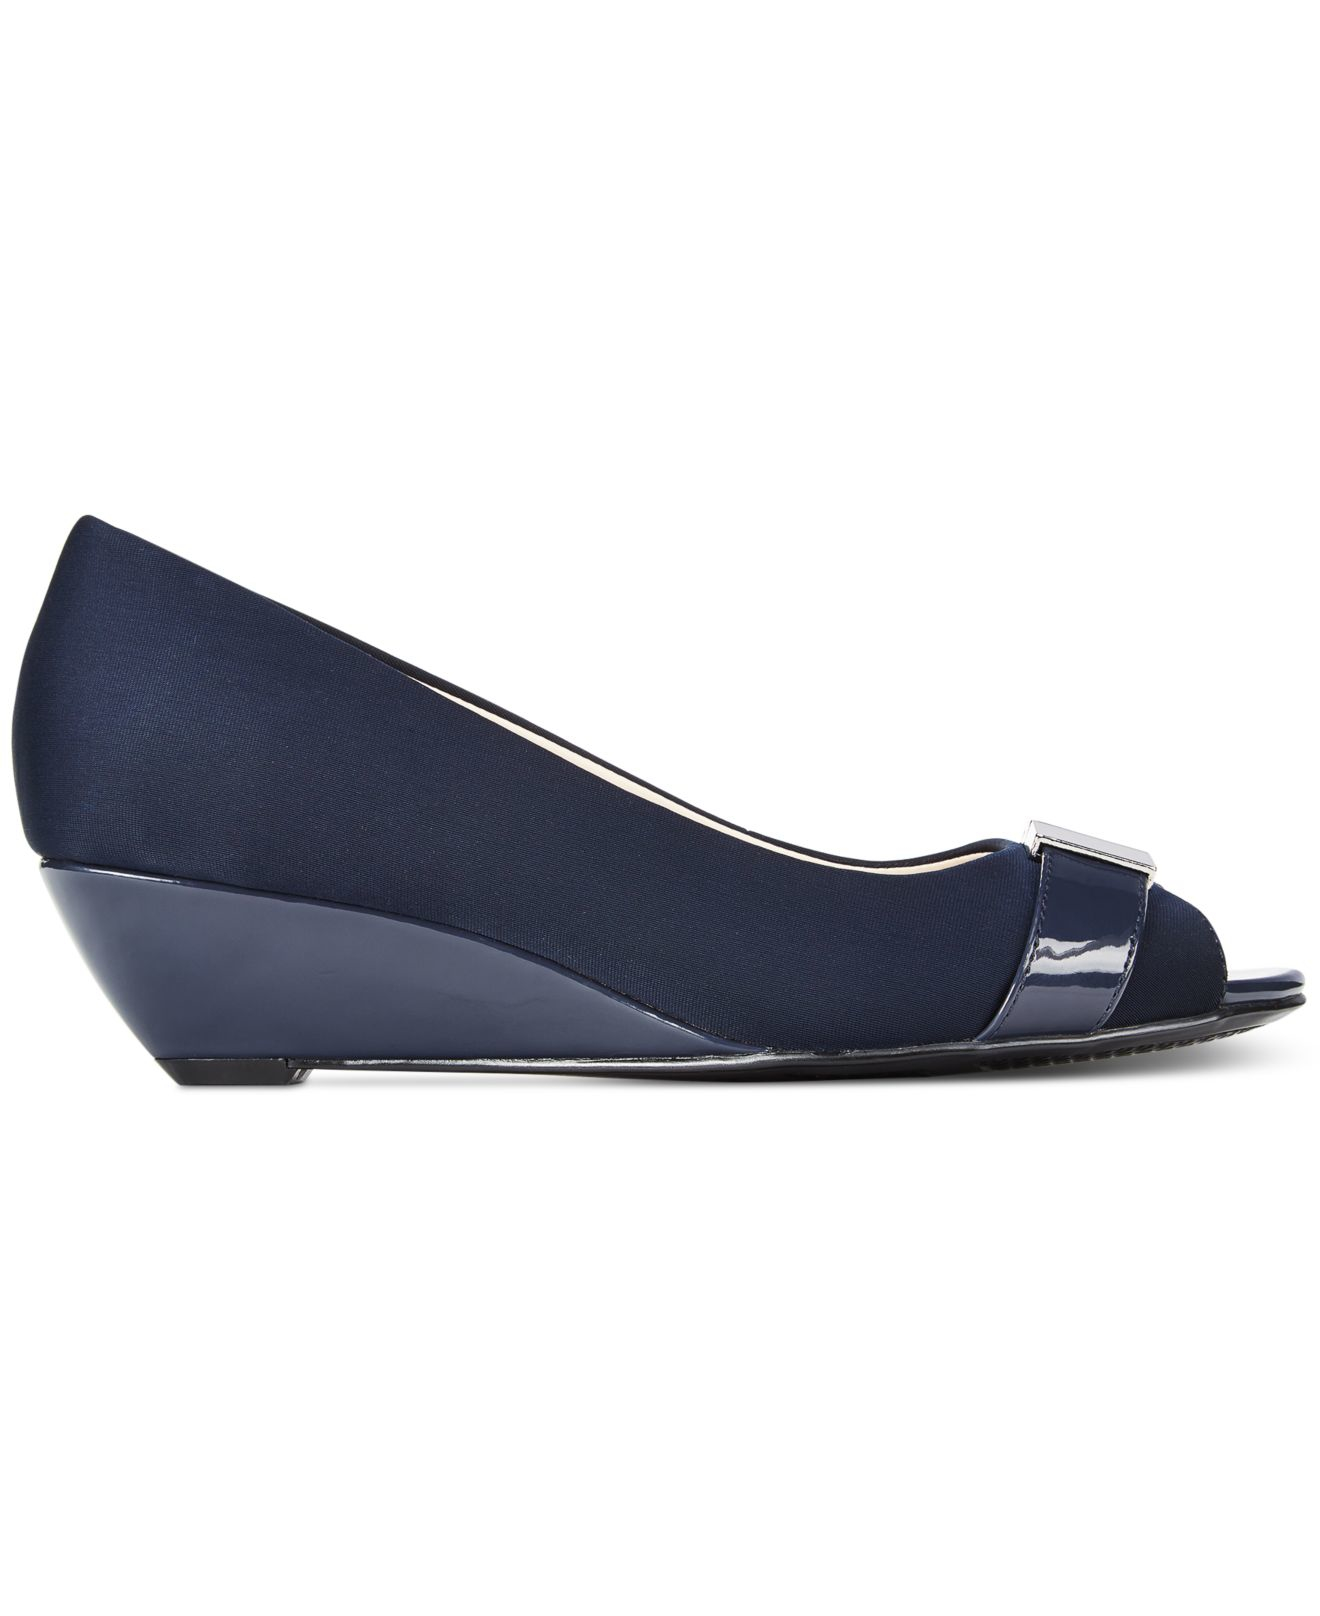 Macys Womens Shoes Comfort Wedges